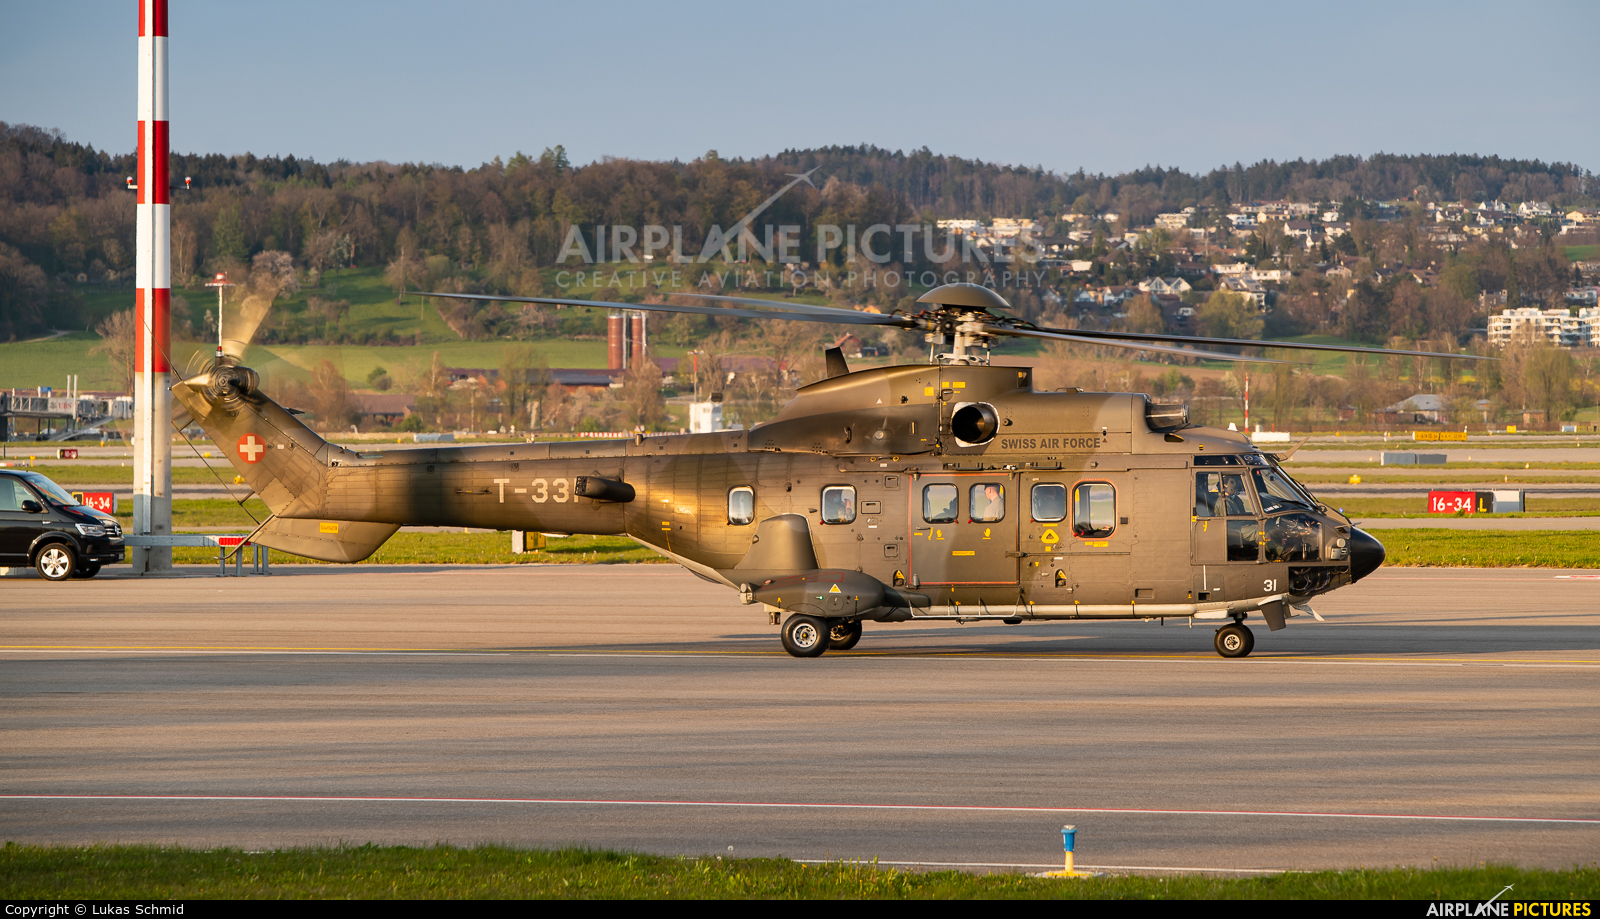 Switzerland - Air Force T-331 aircraft at Zurich